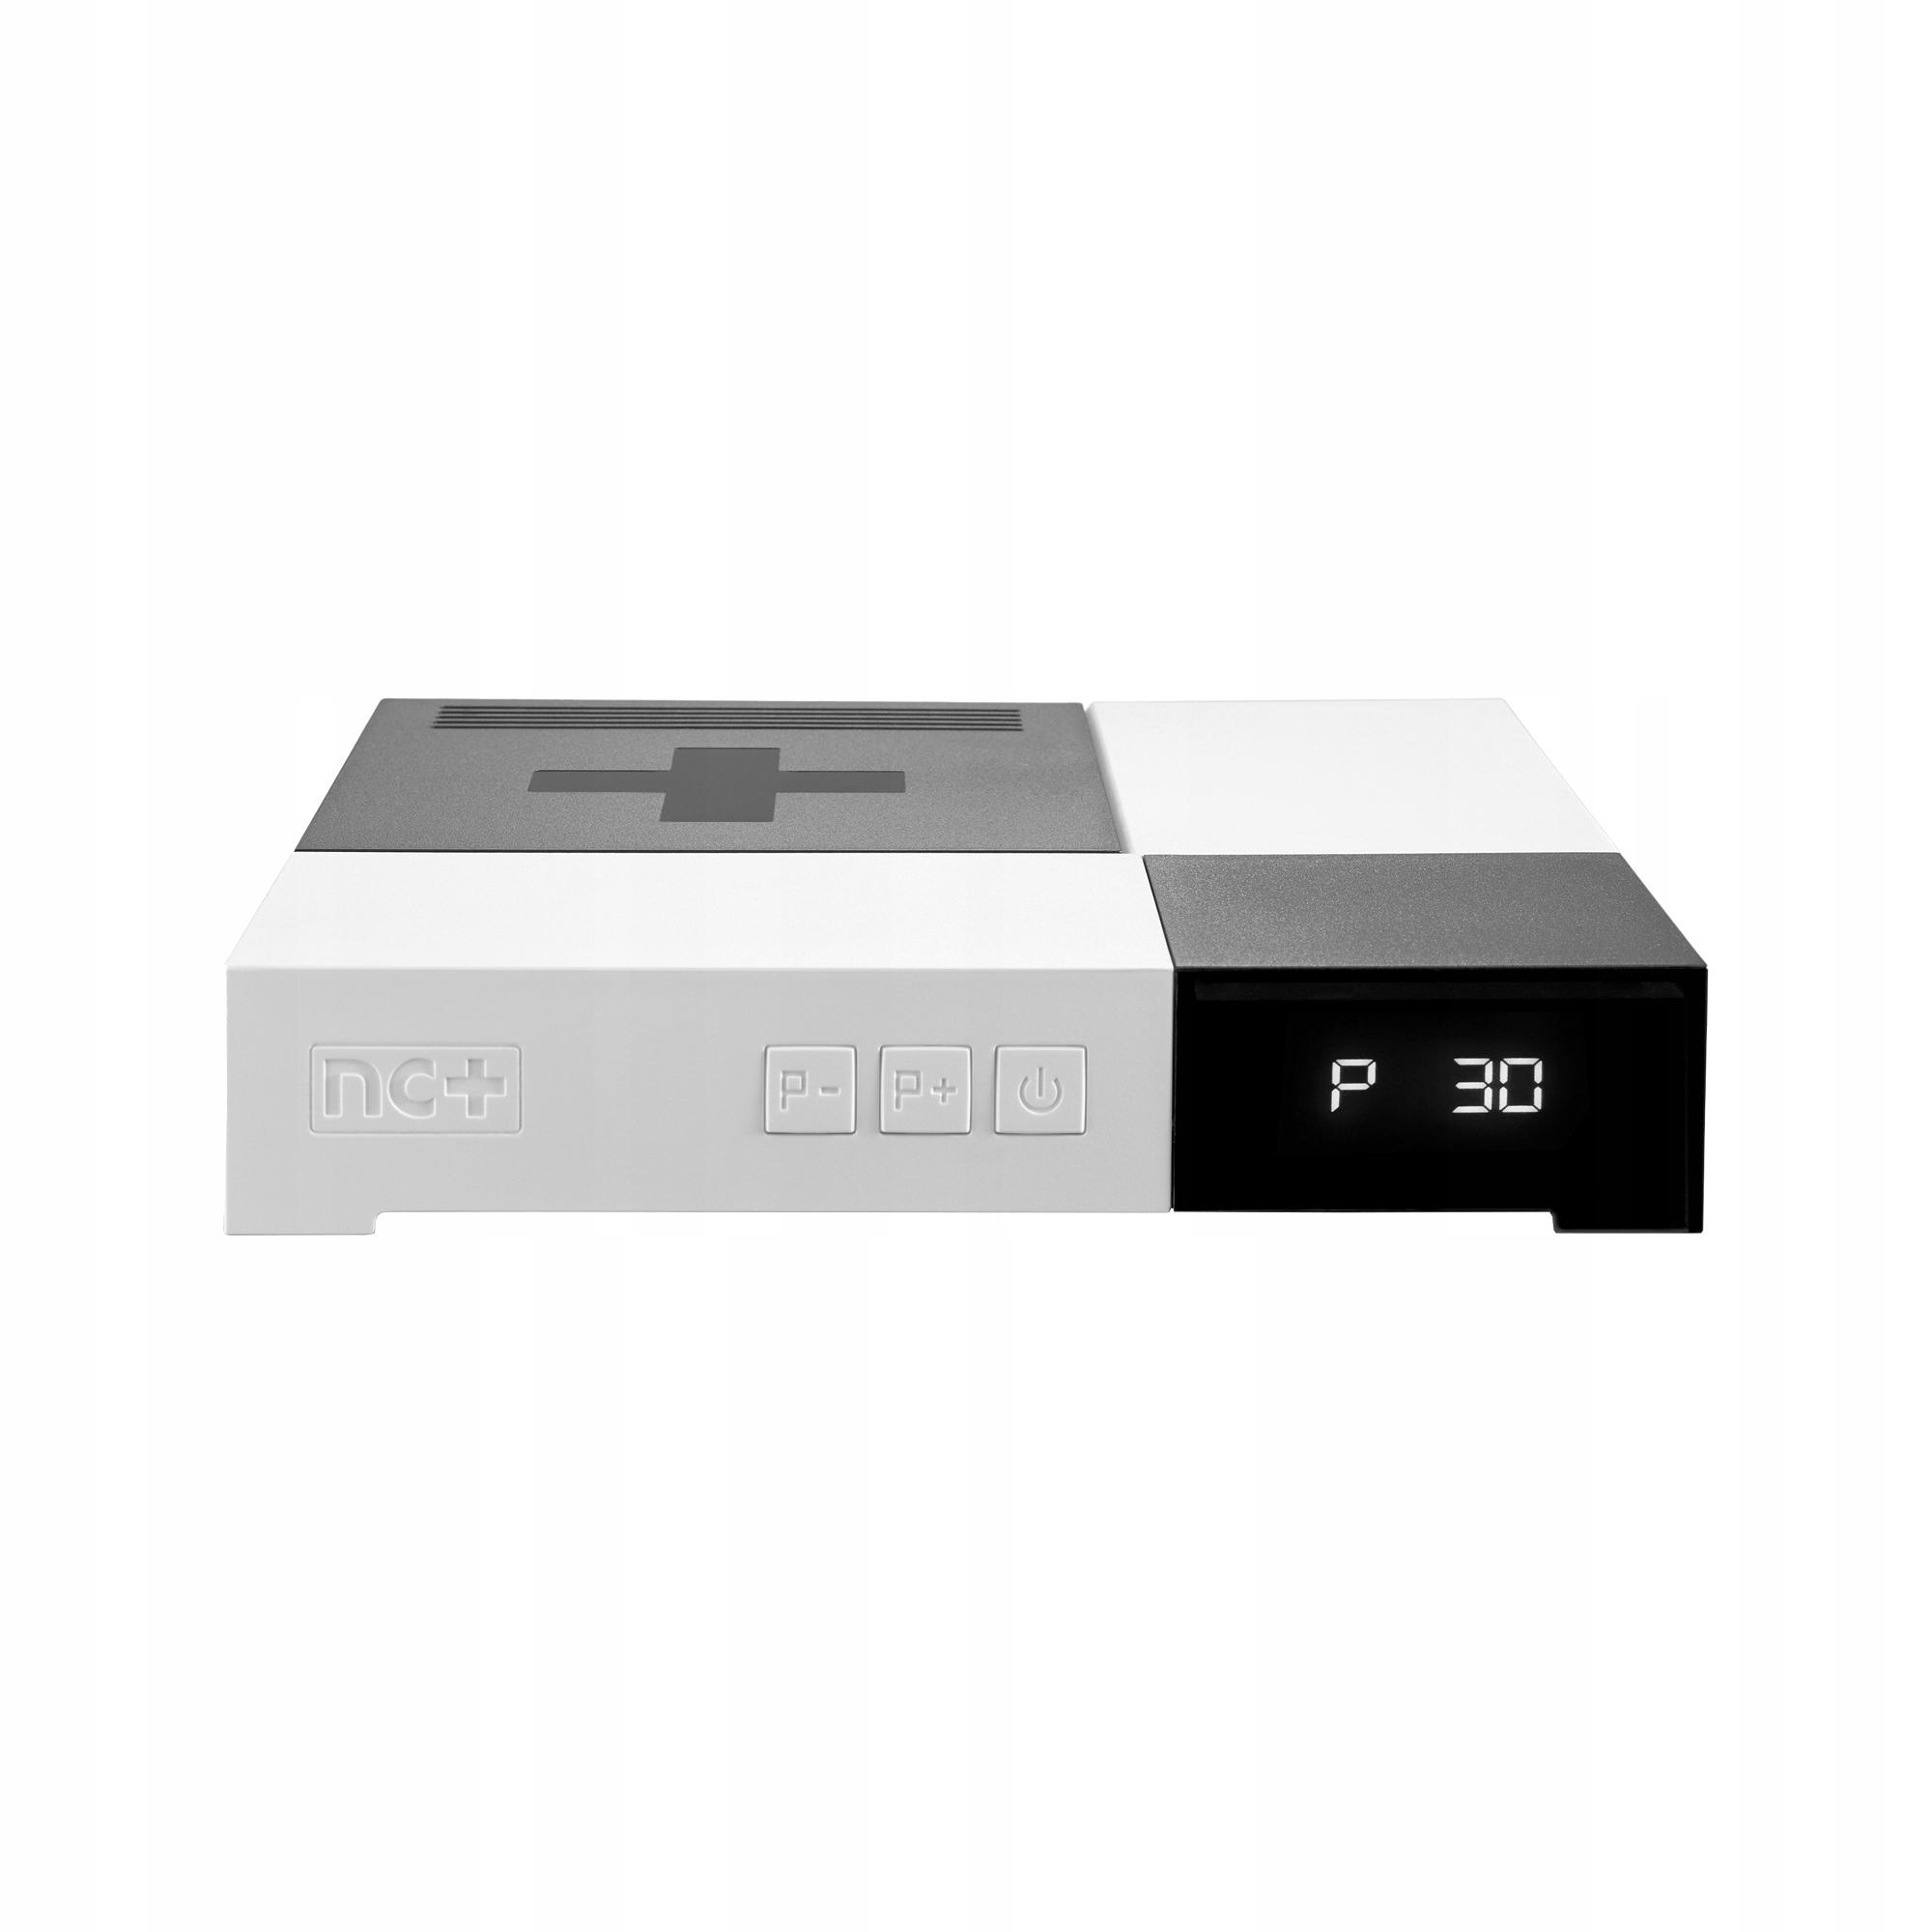 Usługa NC+ telewizja na kartę z Pakietem Start+ BG